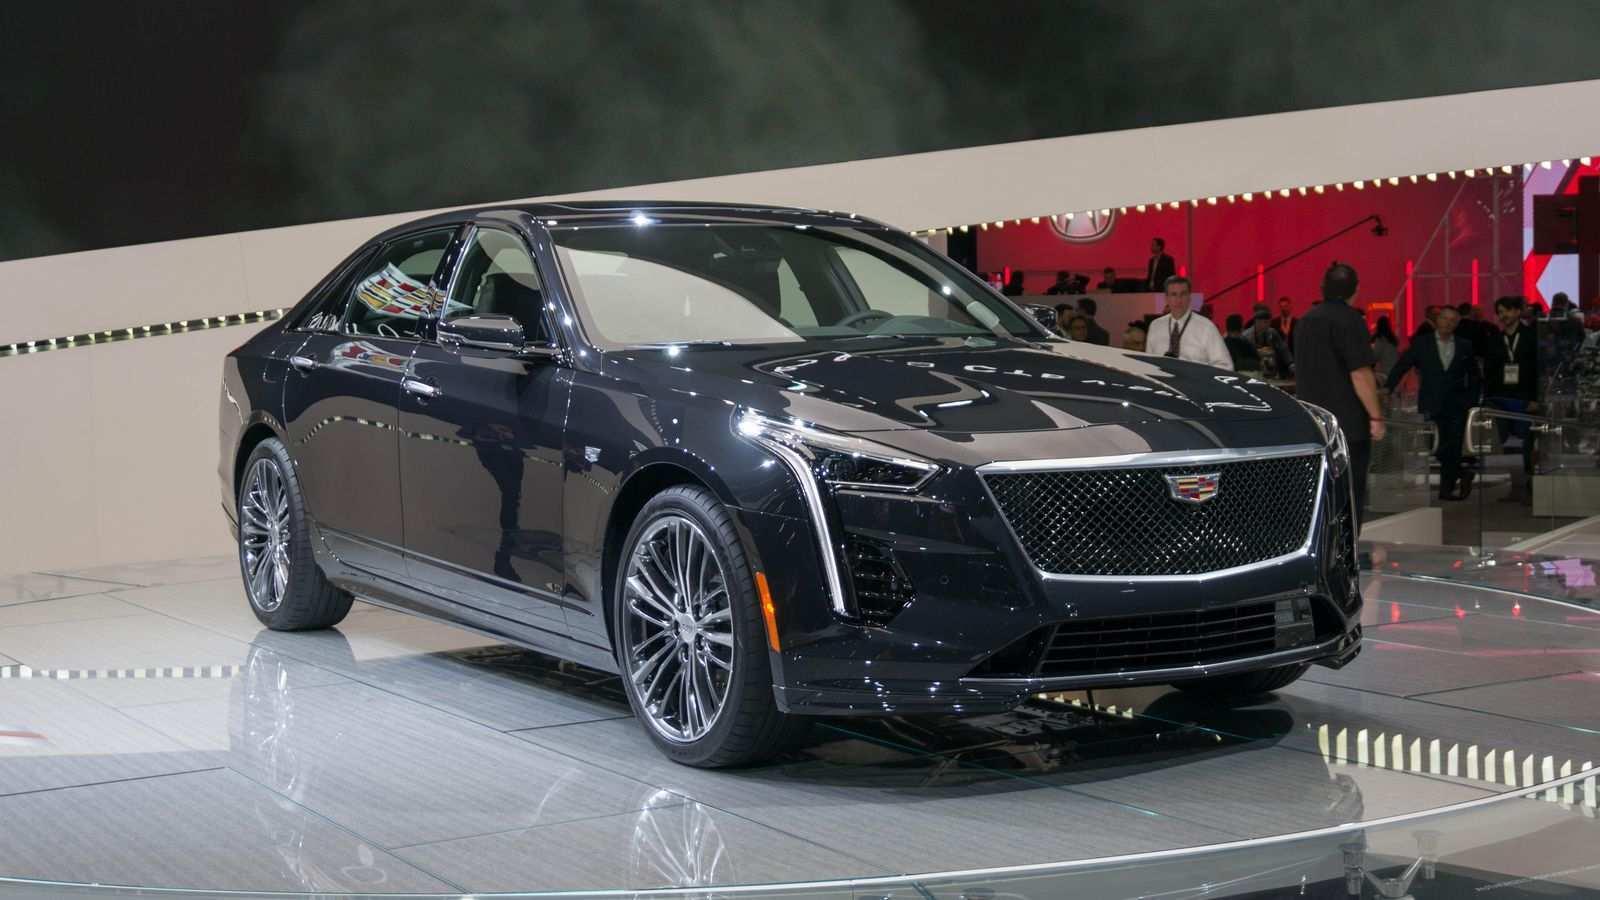 57 New 2019 Cadillac V8 Configurations with 2019 Cadillac V8